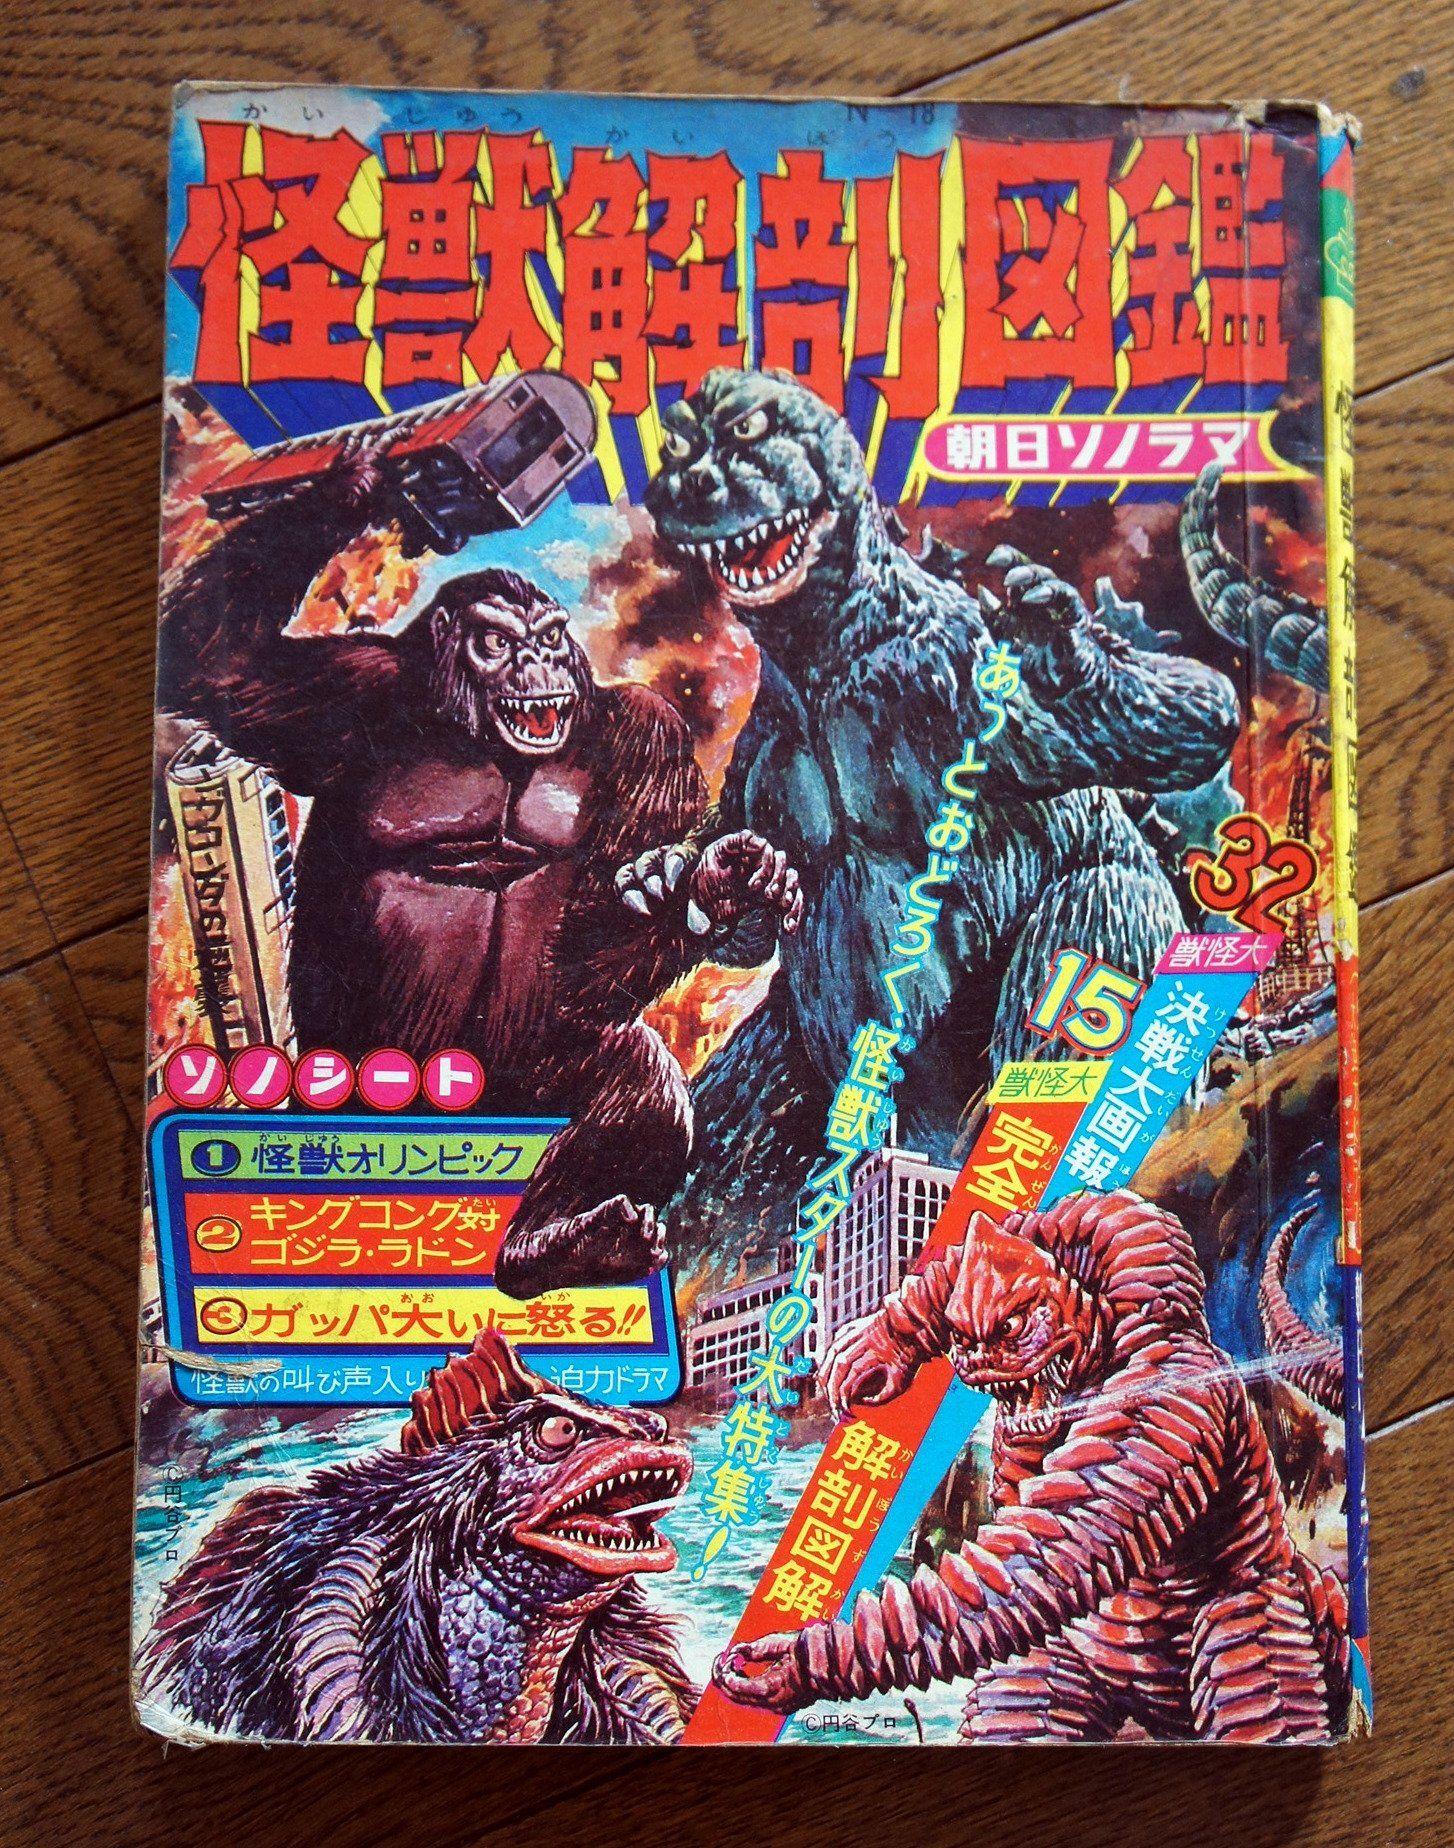 amazon co jp 怪獣解剖図鑑 1967年 本 ゴジラvsキングコング 図鑑 怪獣 イラスト